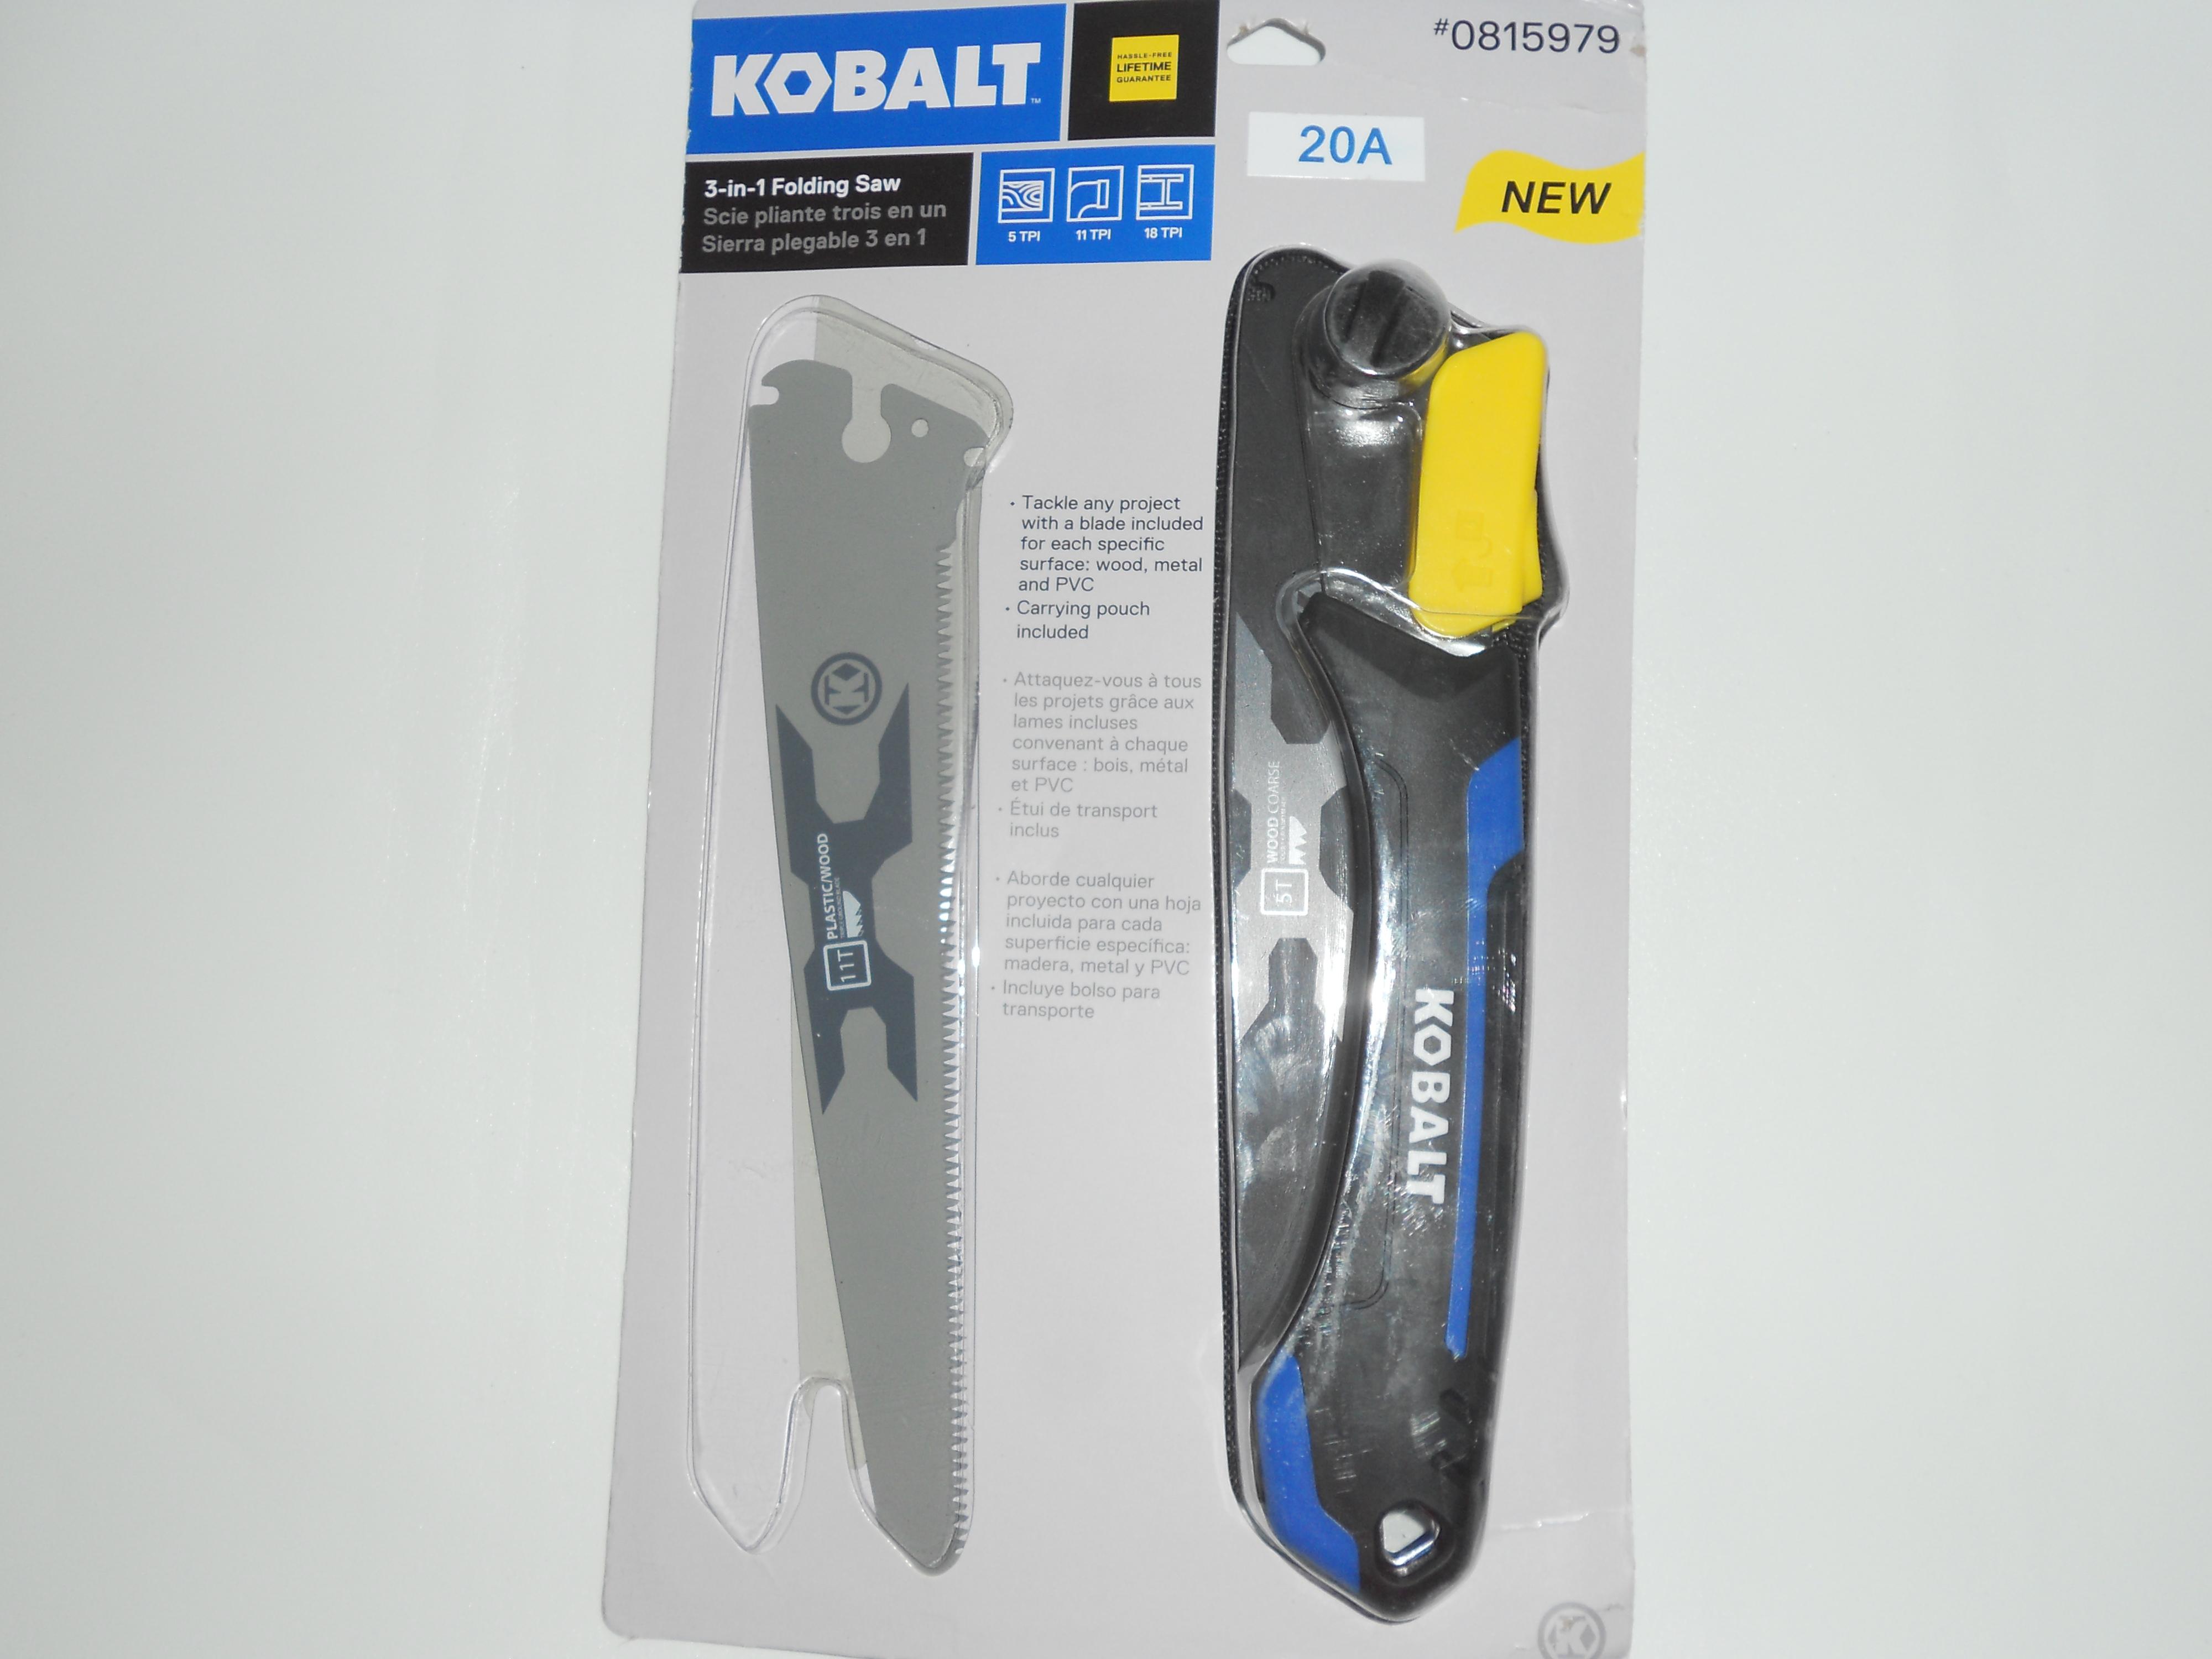 Kobalt 3-in-1 folding saw